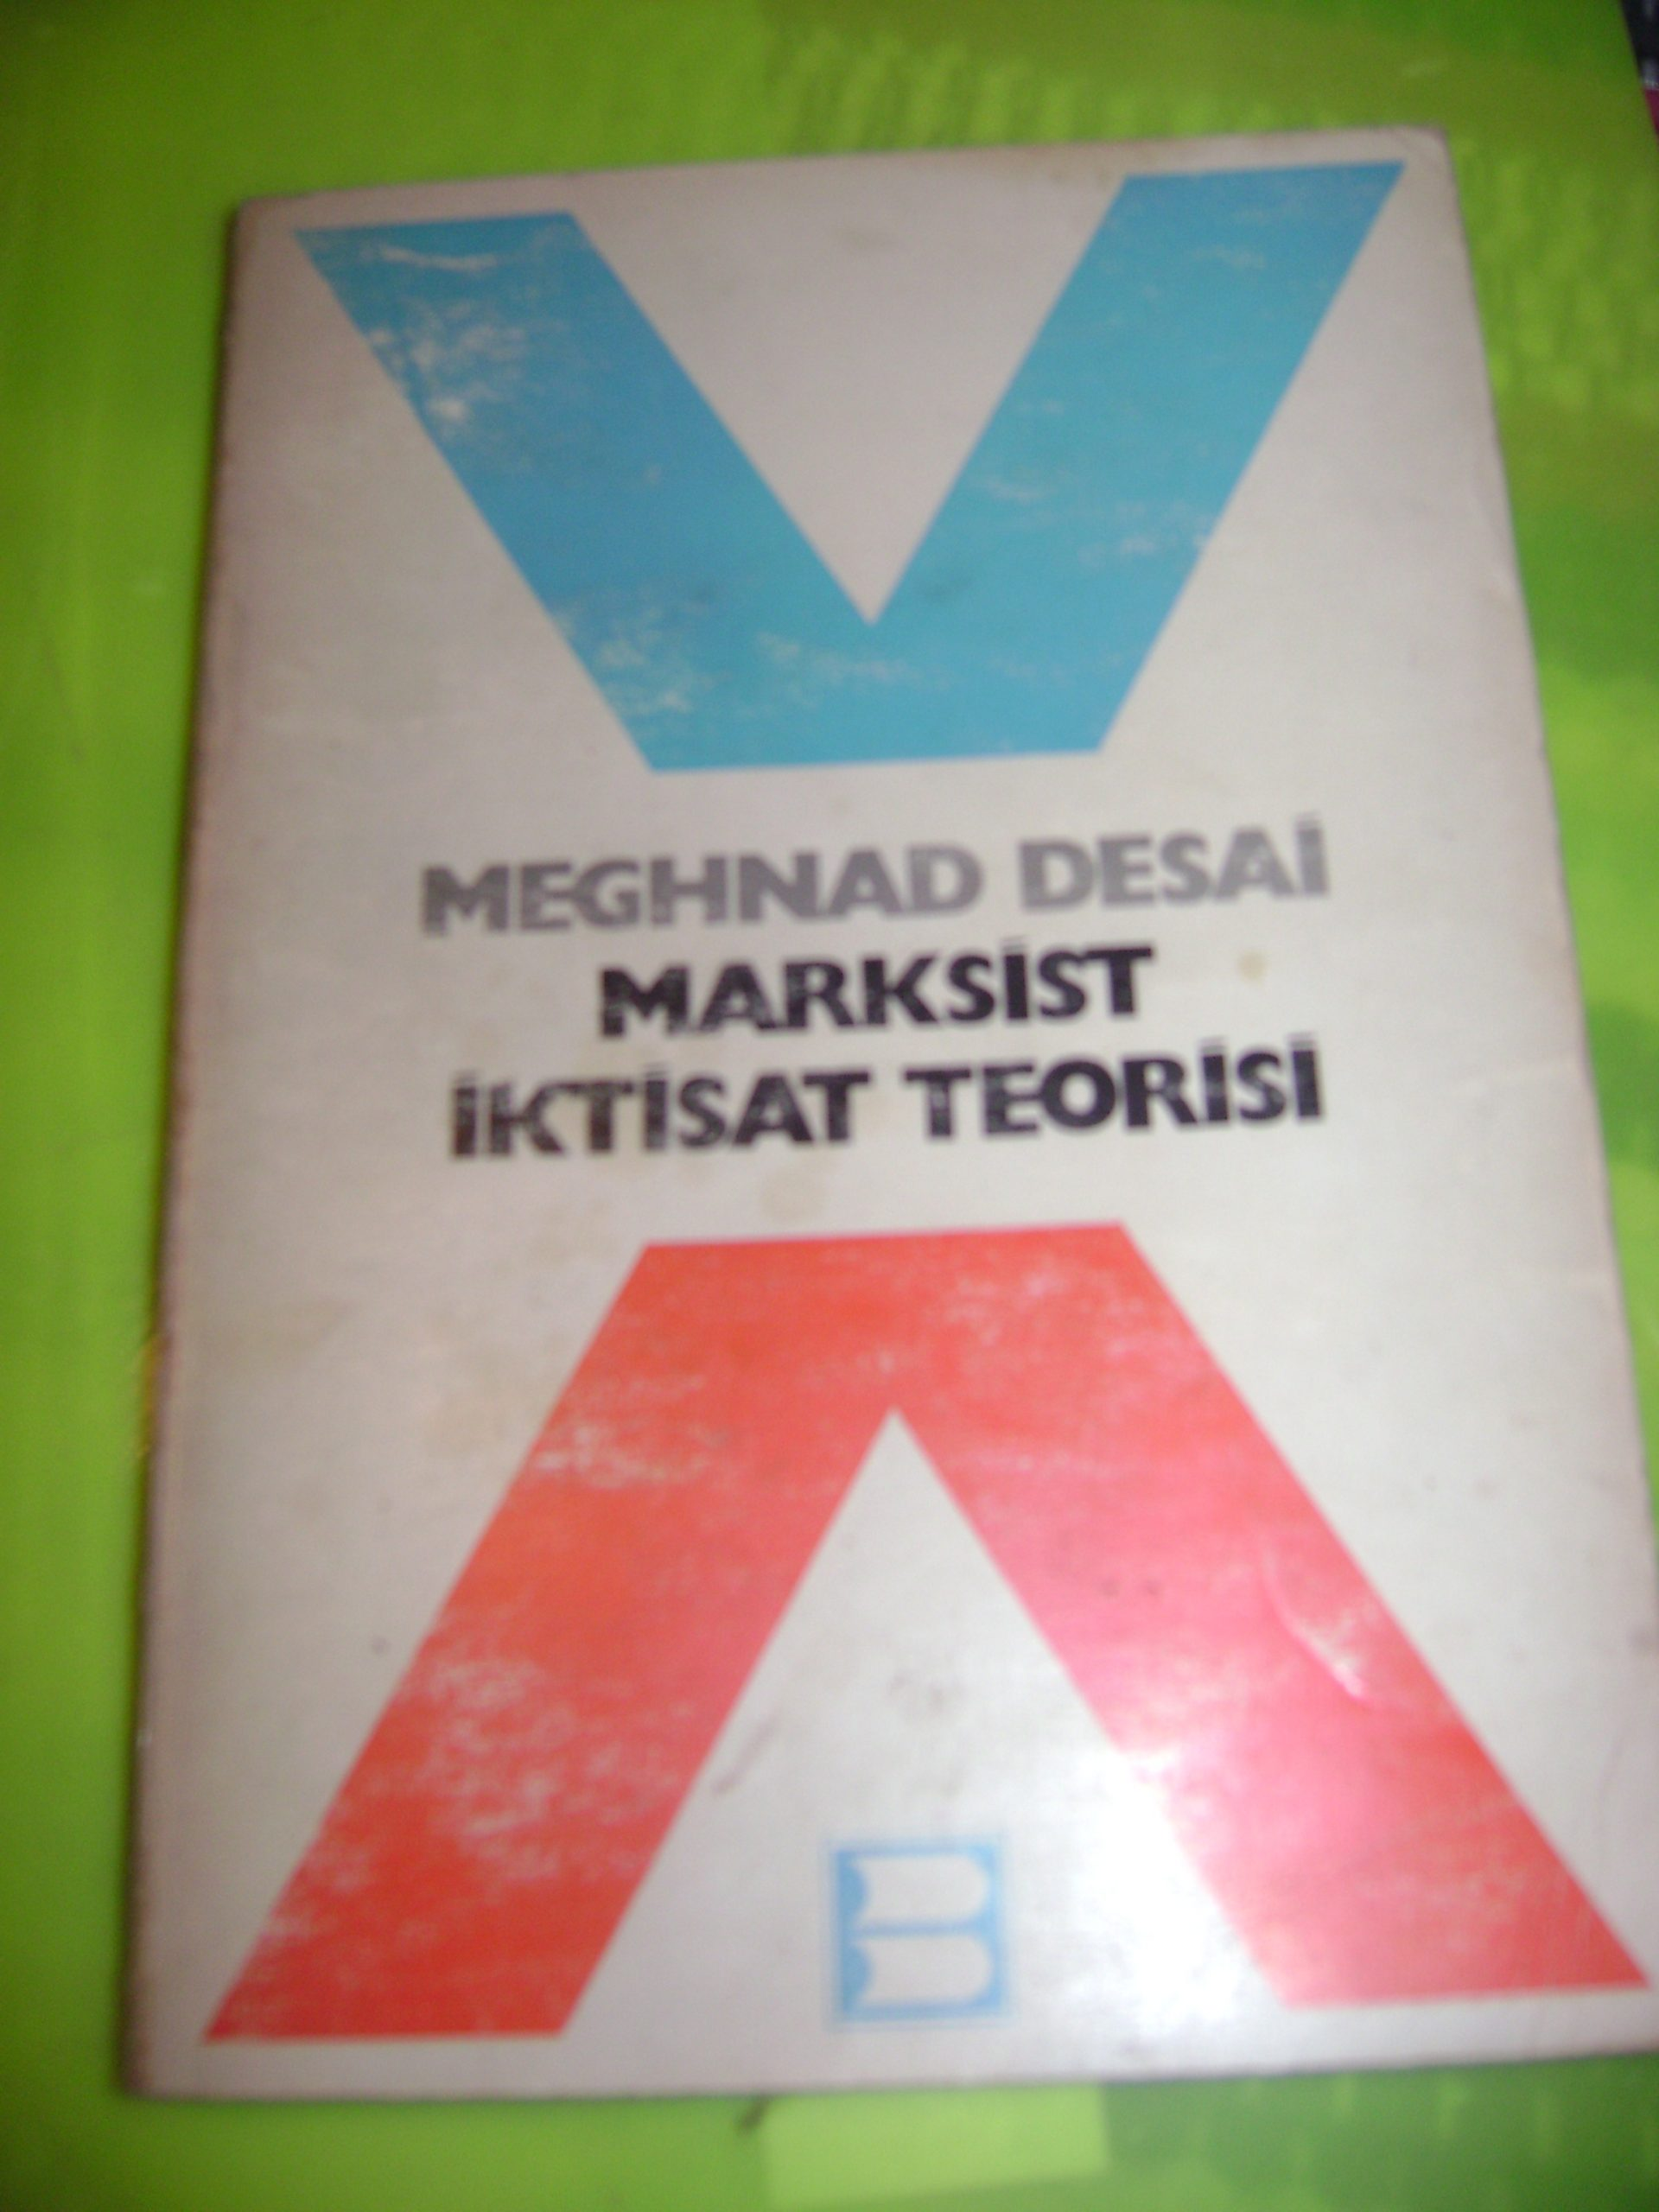 MARKSİST İKTİSAT TEORİSİ/Meghnad Desai/15TL